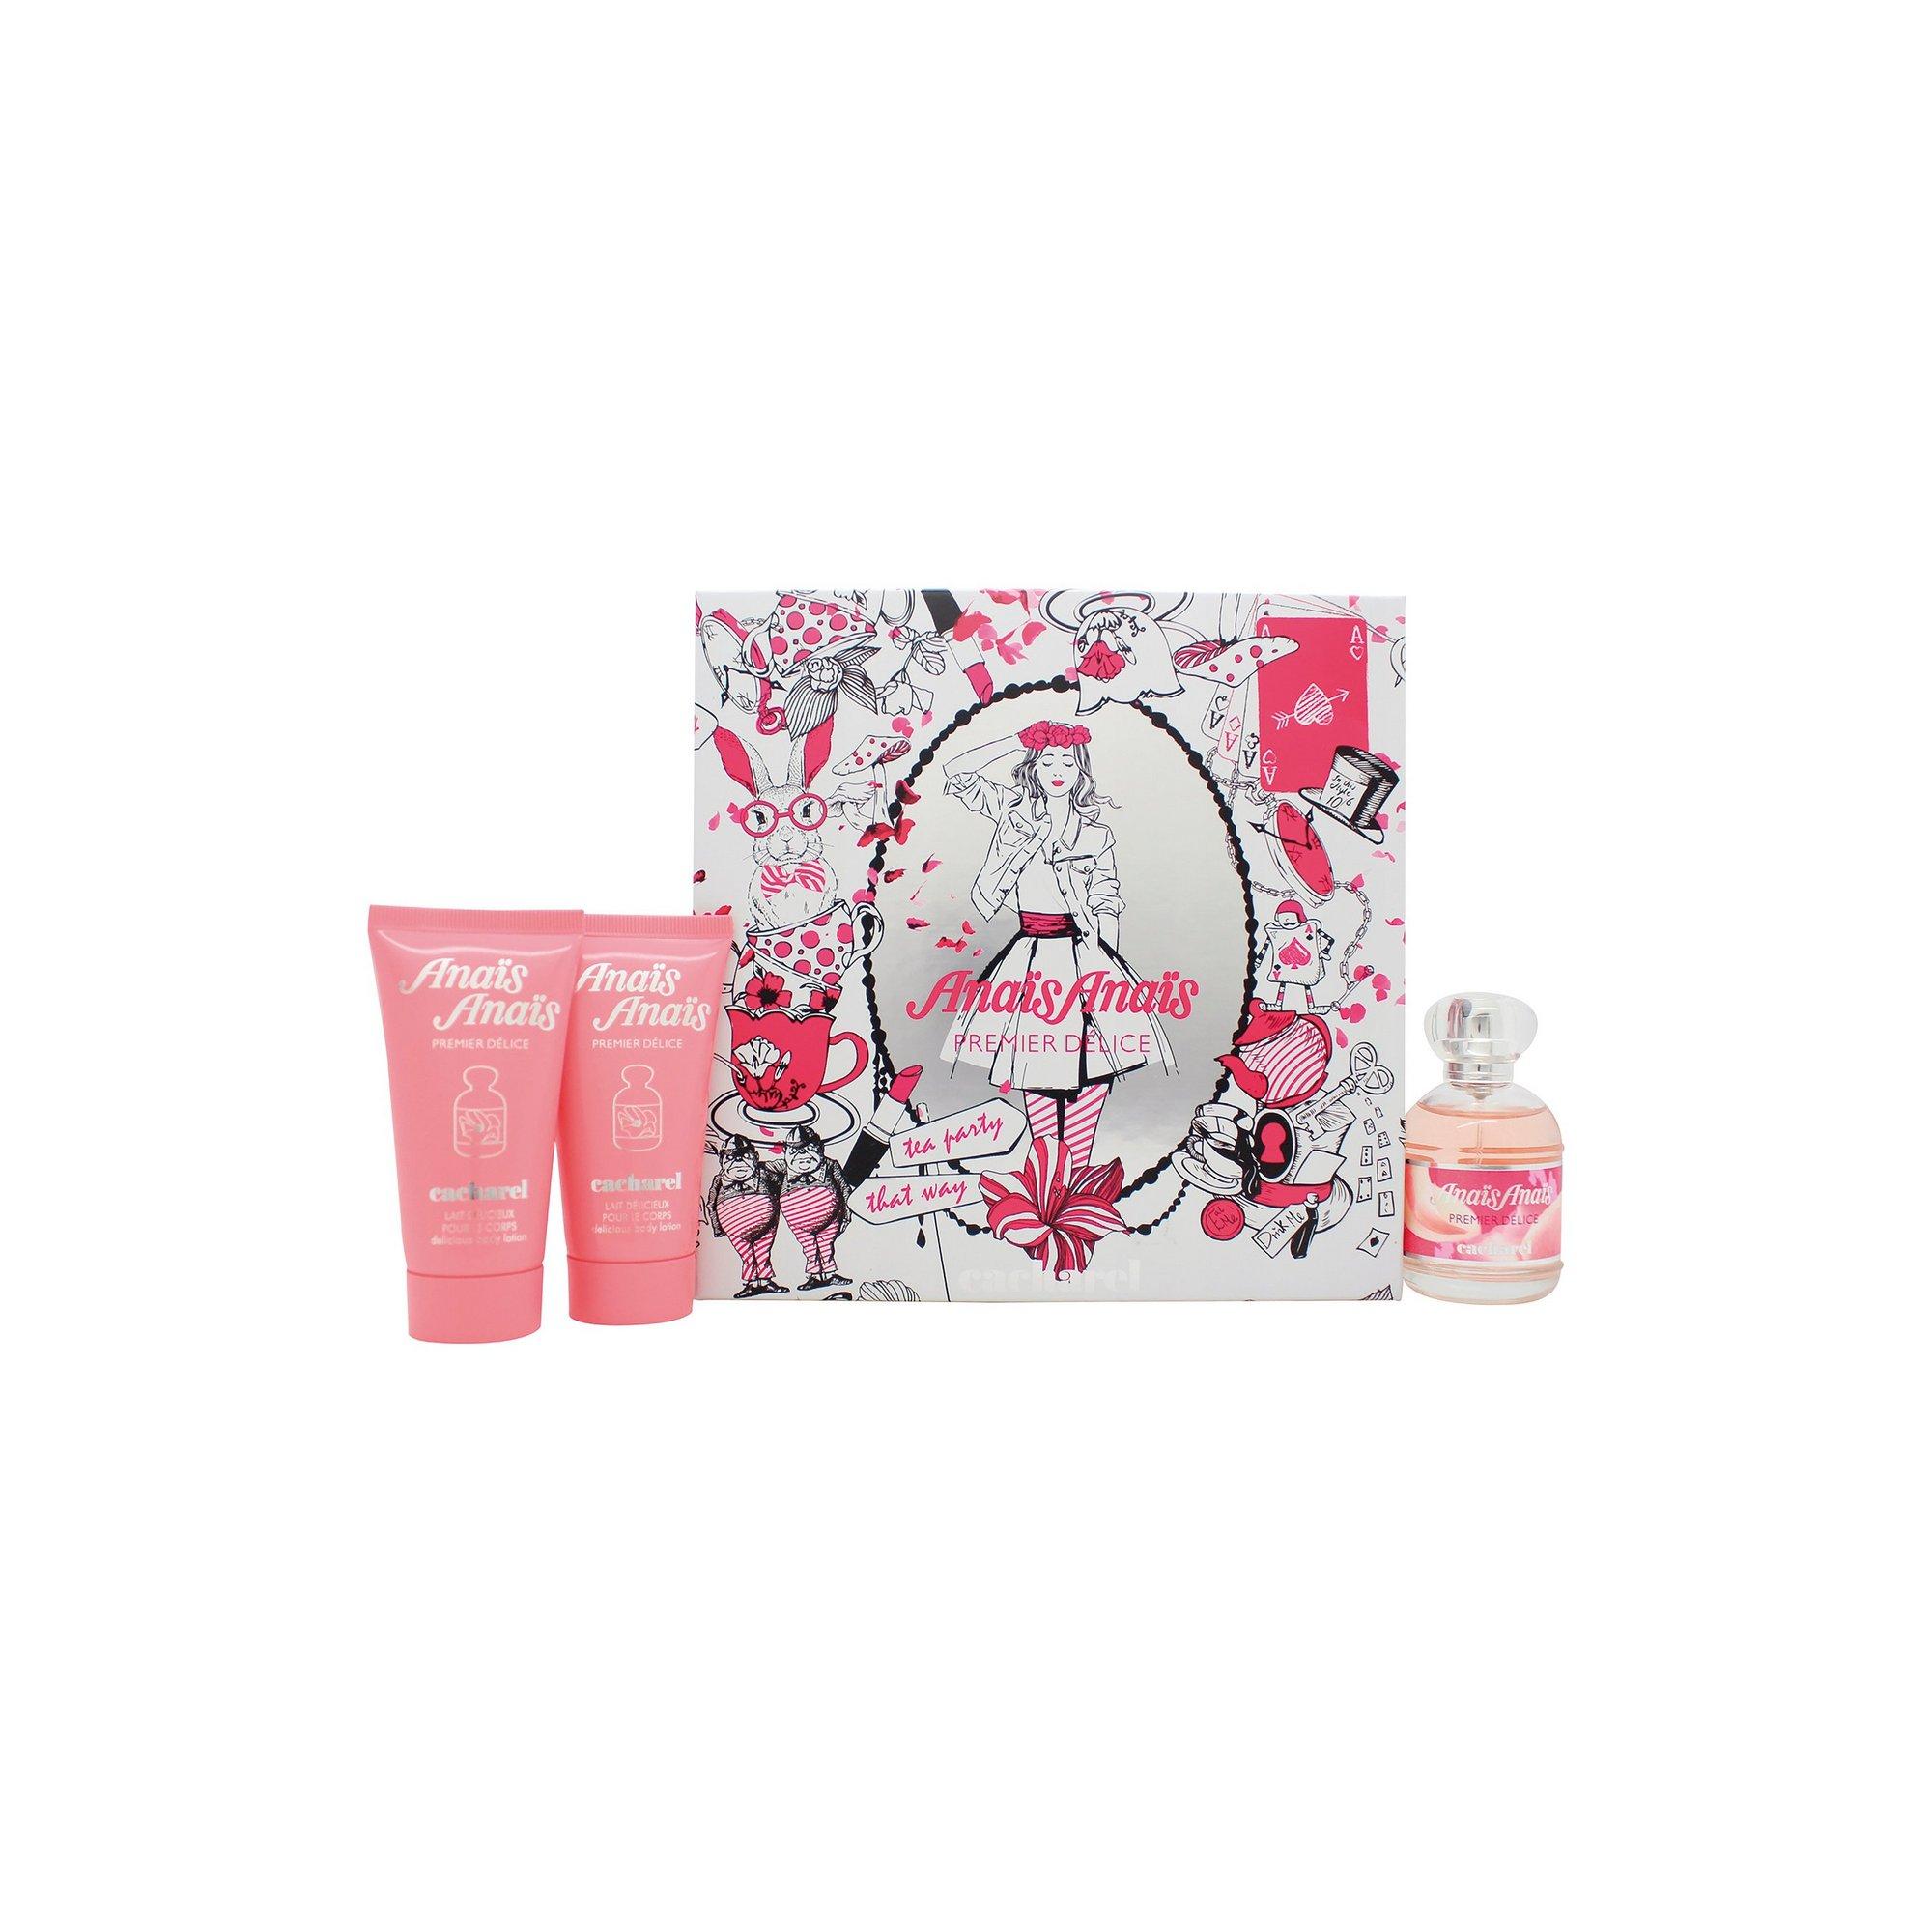 Image of Cacharel Anais Anais Premier Delice Gift Set 30ml EDT